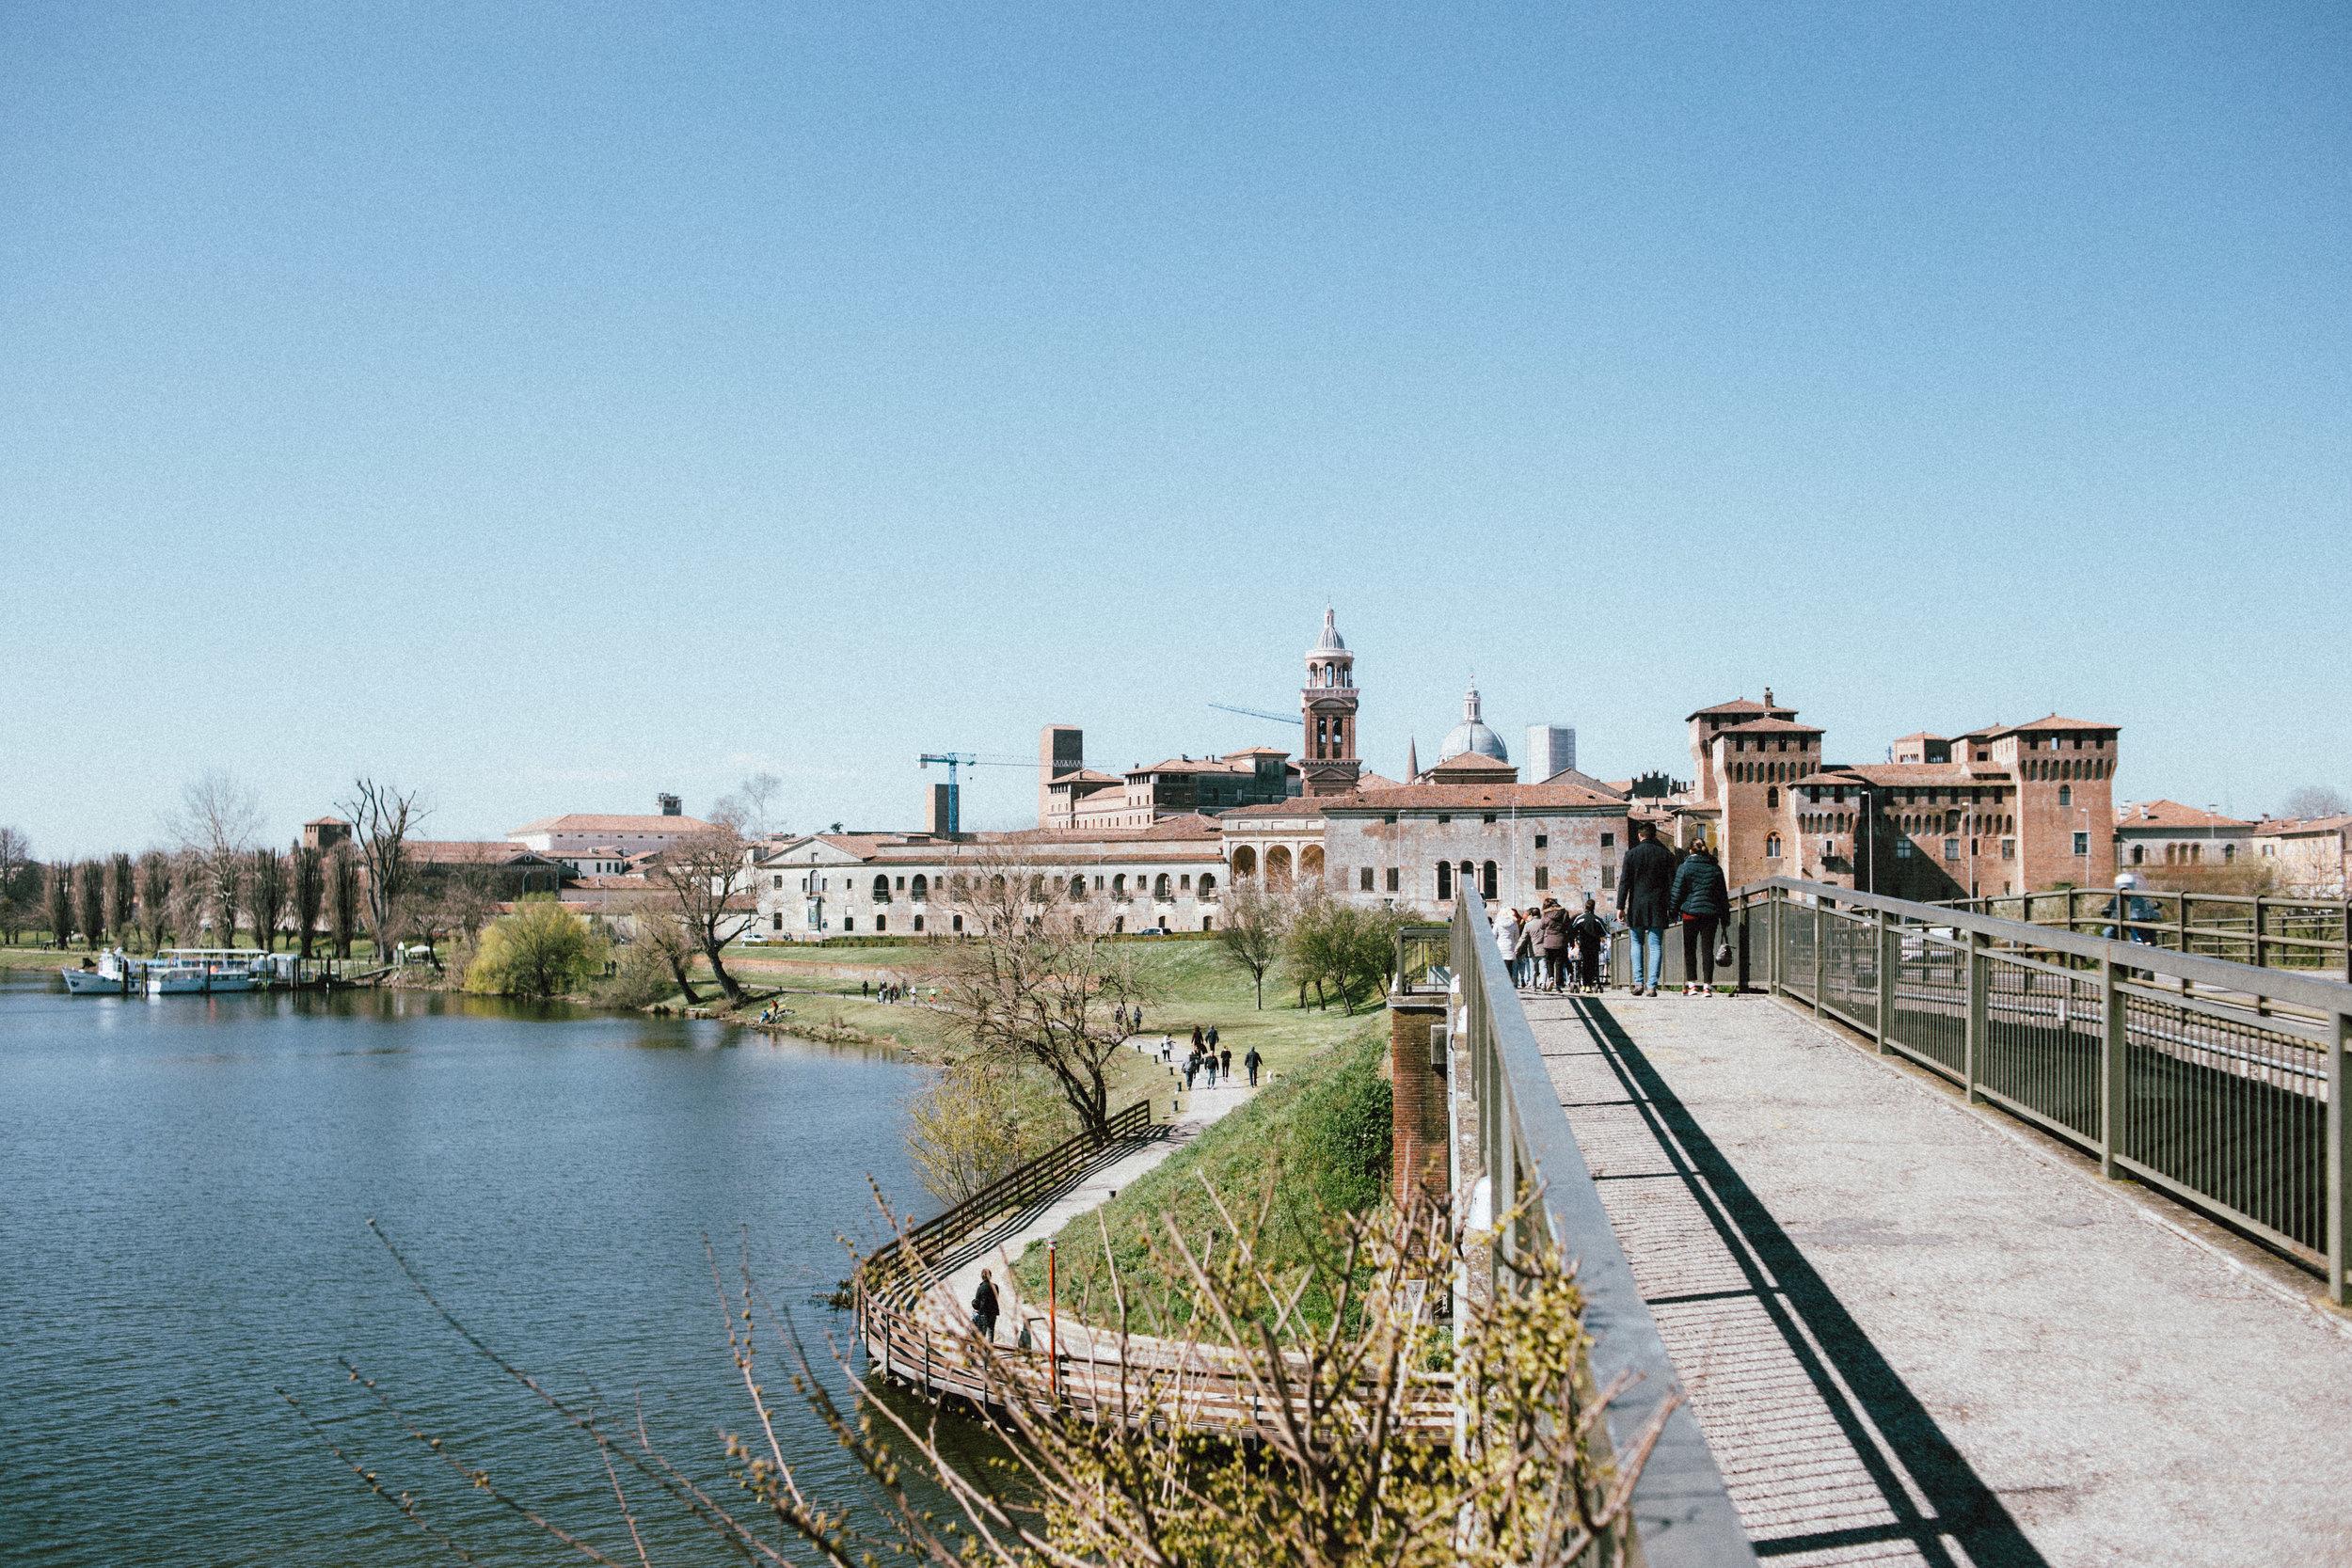 023 - Mantova.jpg